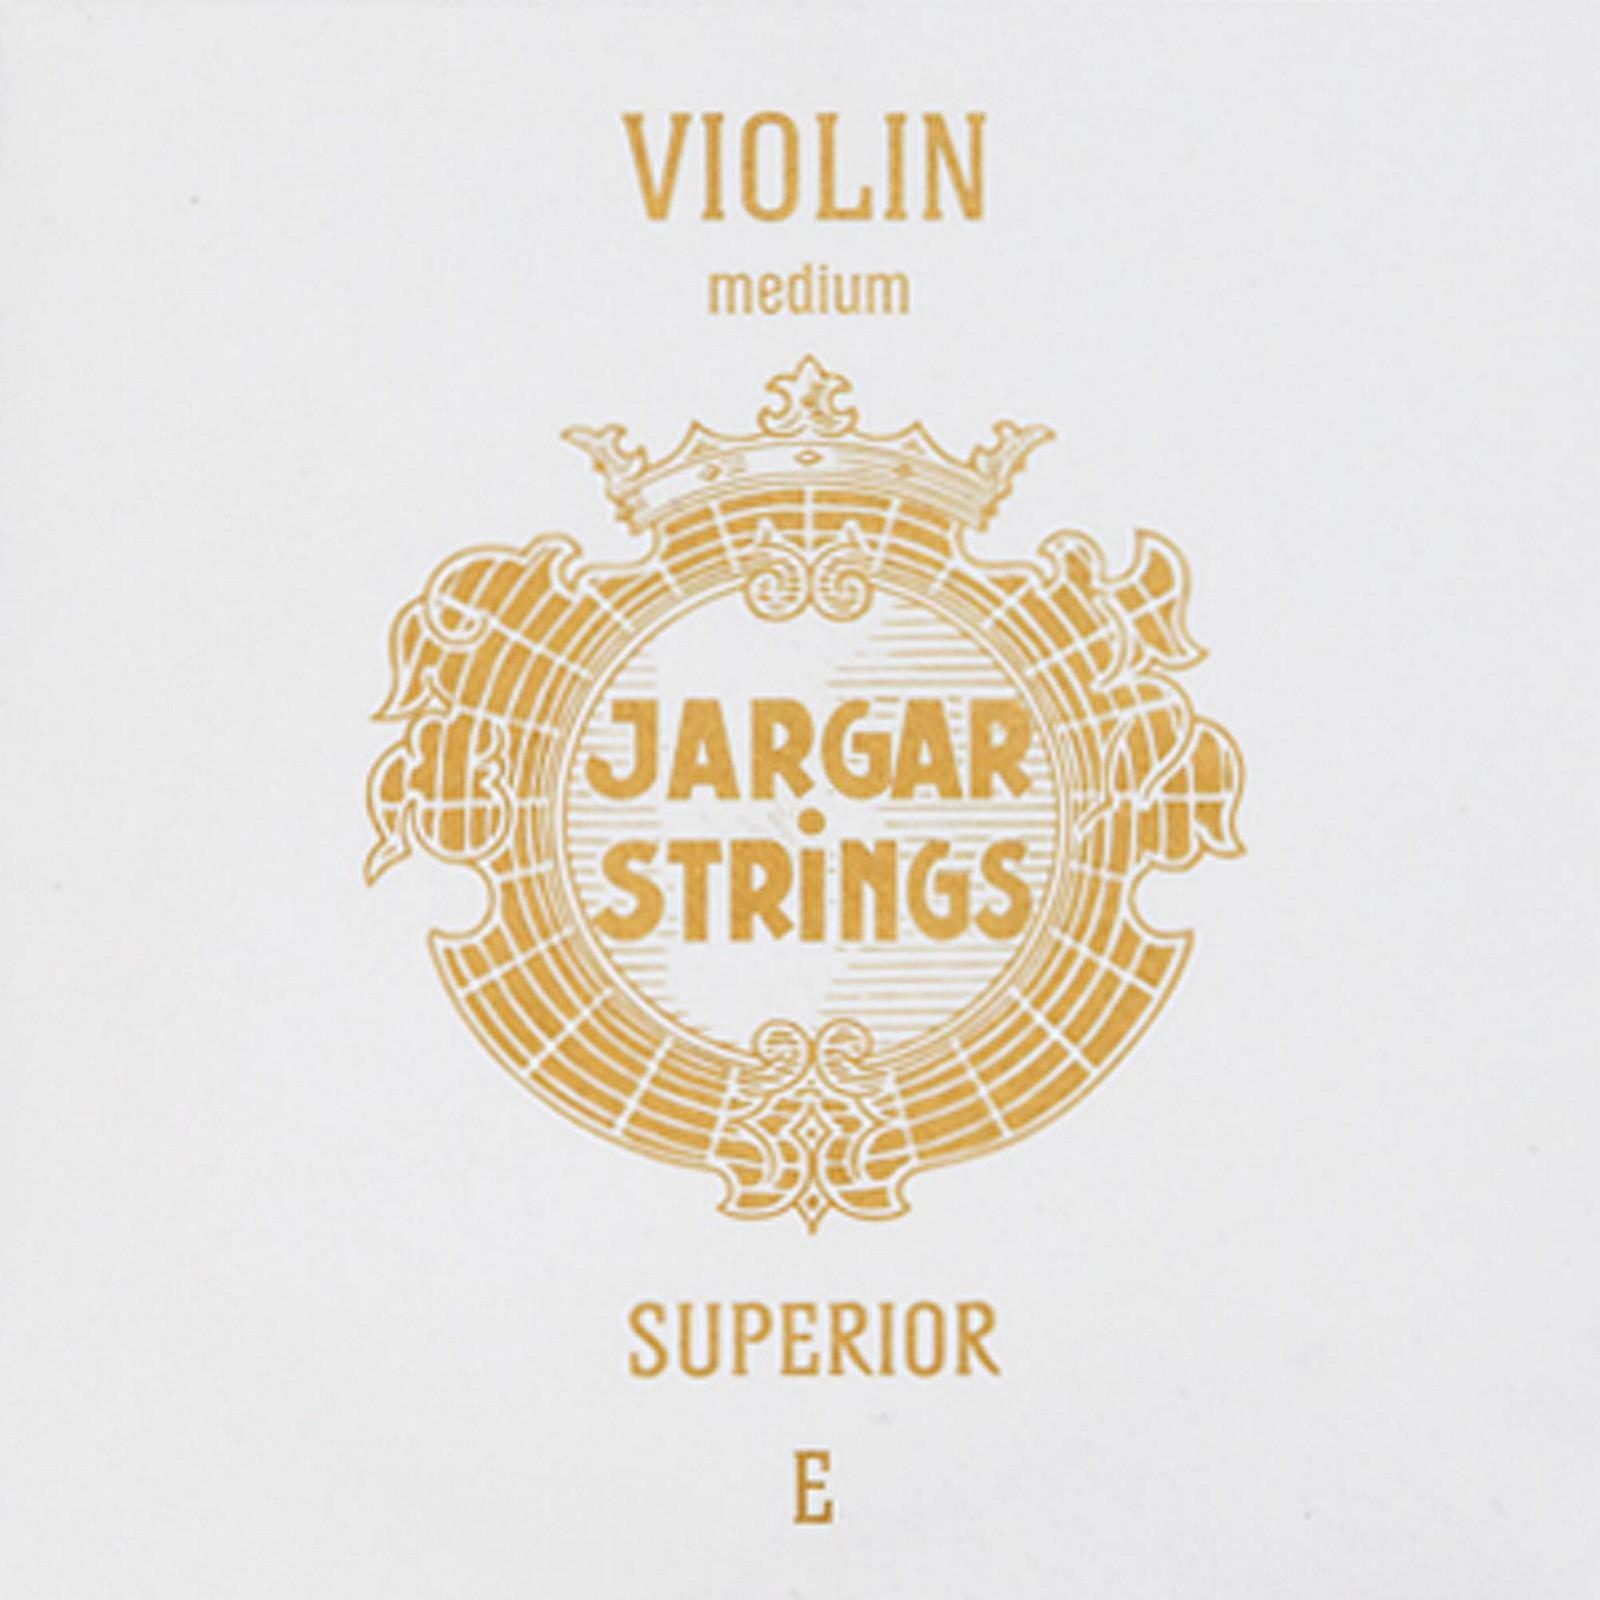 Jargar Superior Series Tin Plated Violin E String